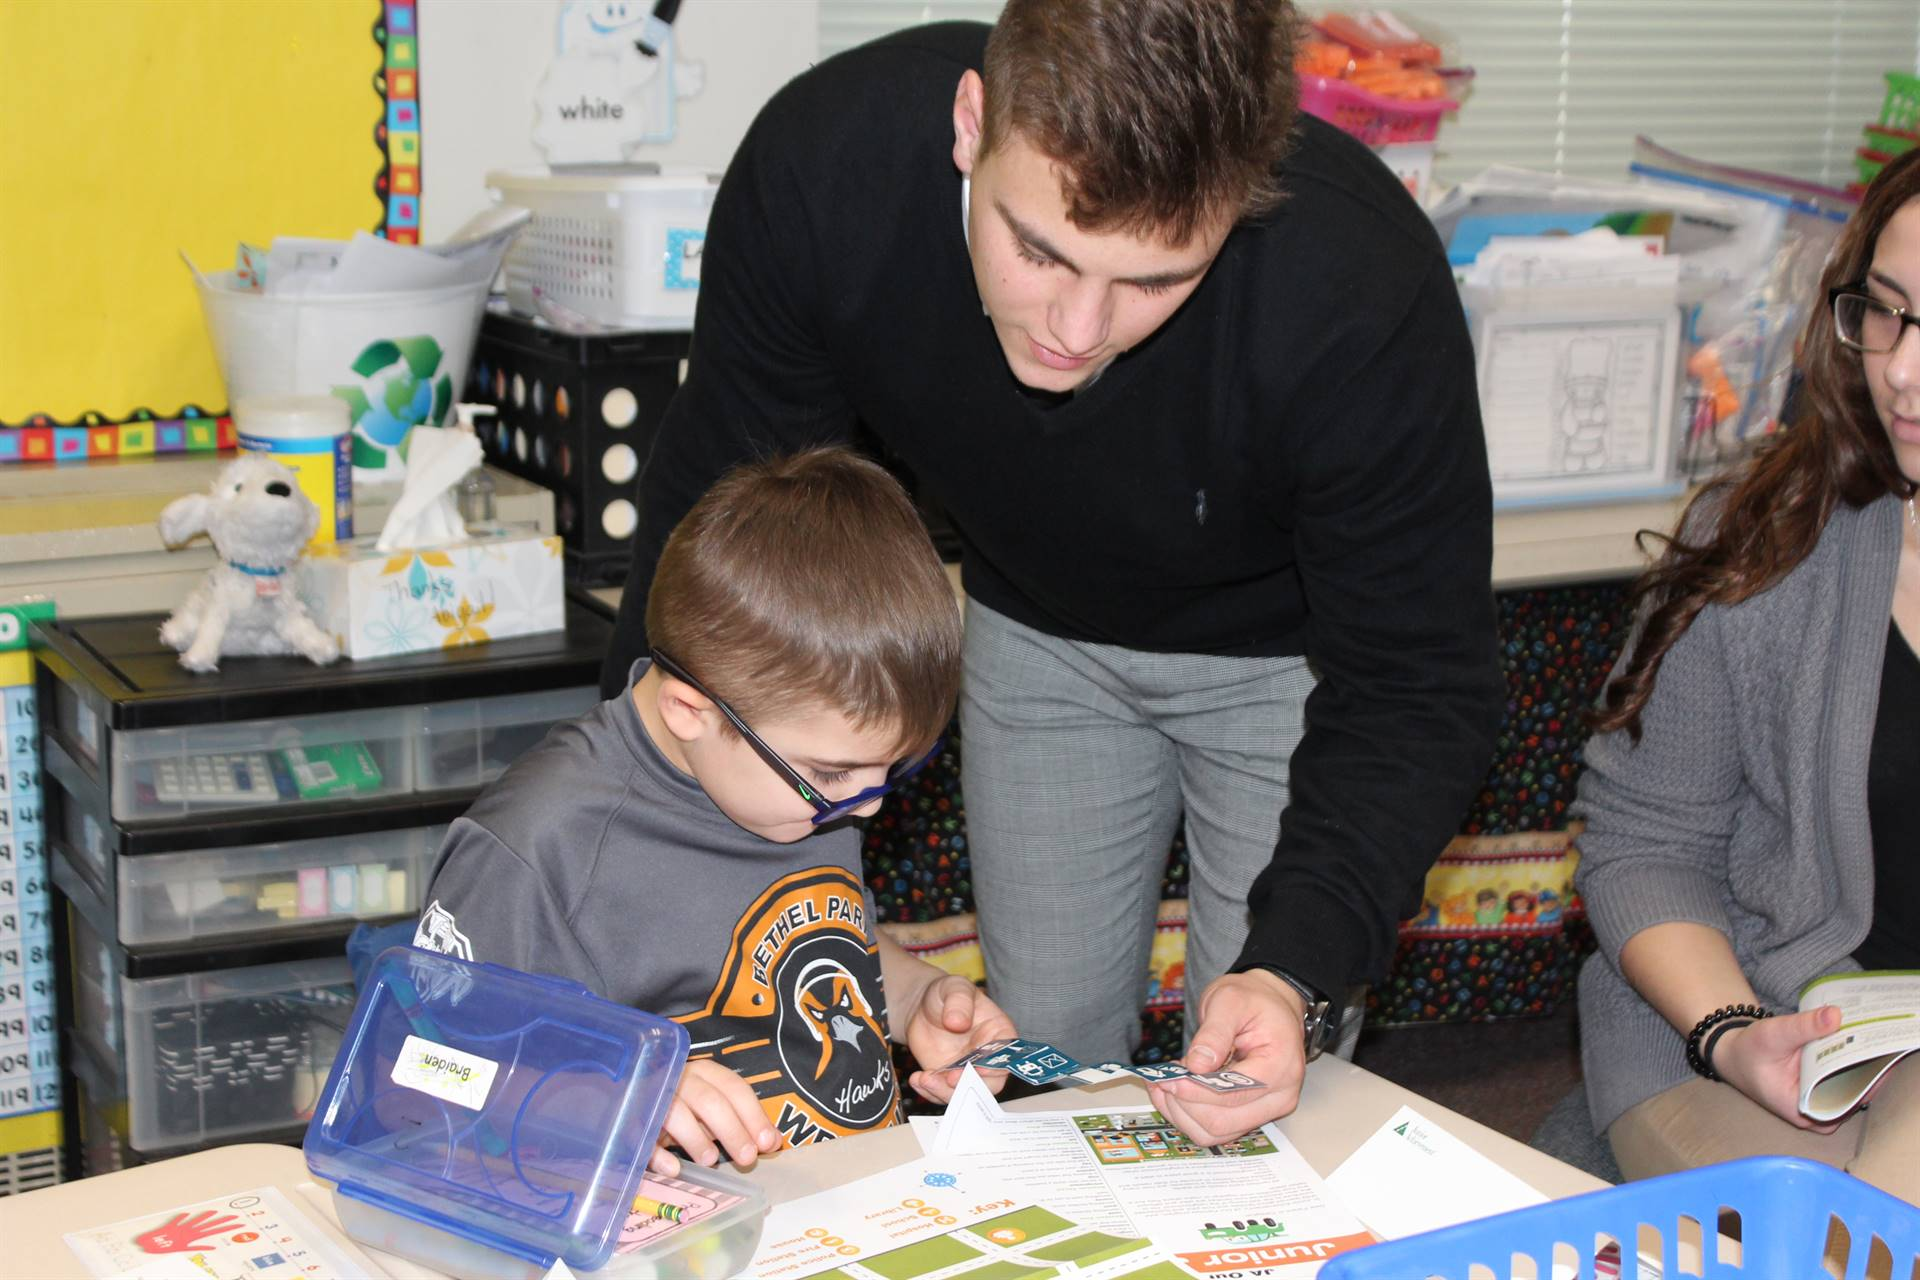 High school student helping a Penn student